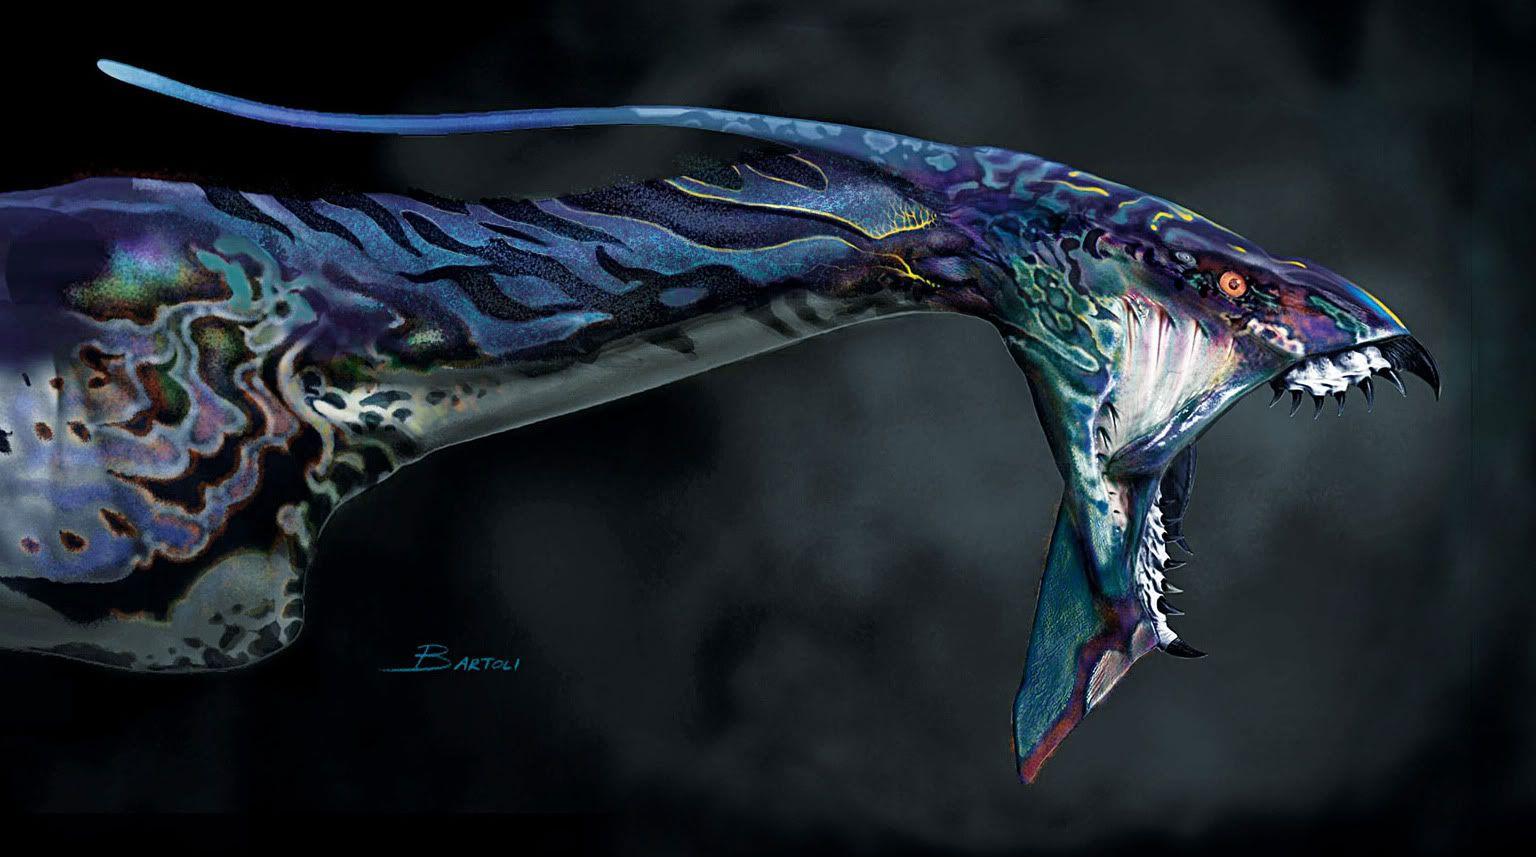 самарканде драконы из аватара картинки военнослужащих